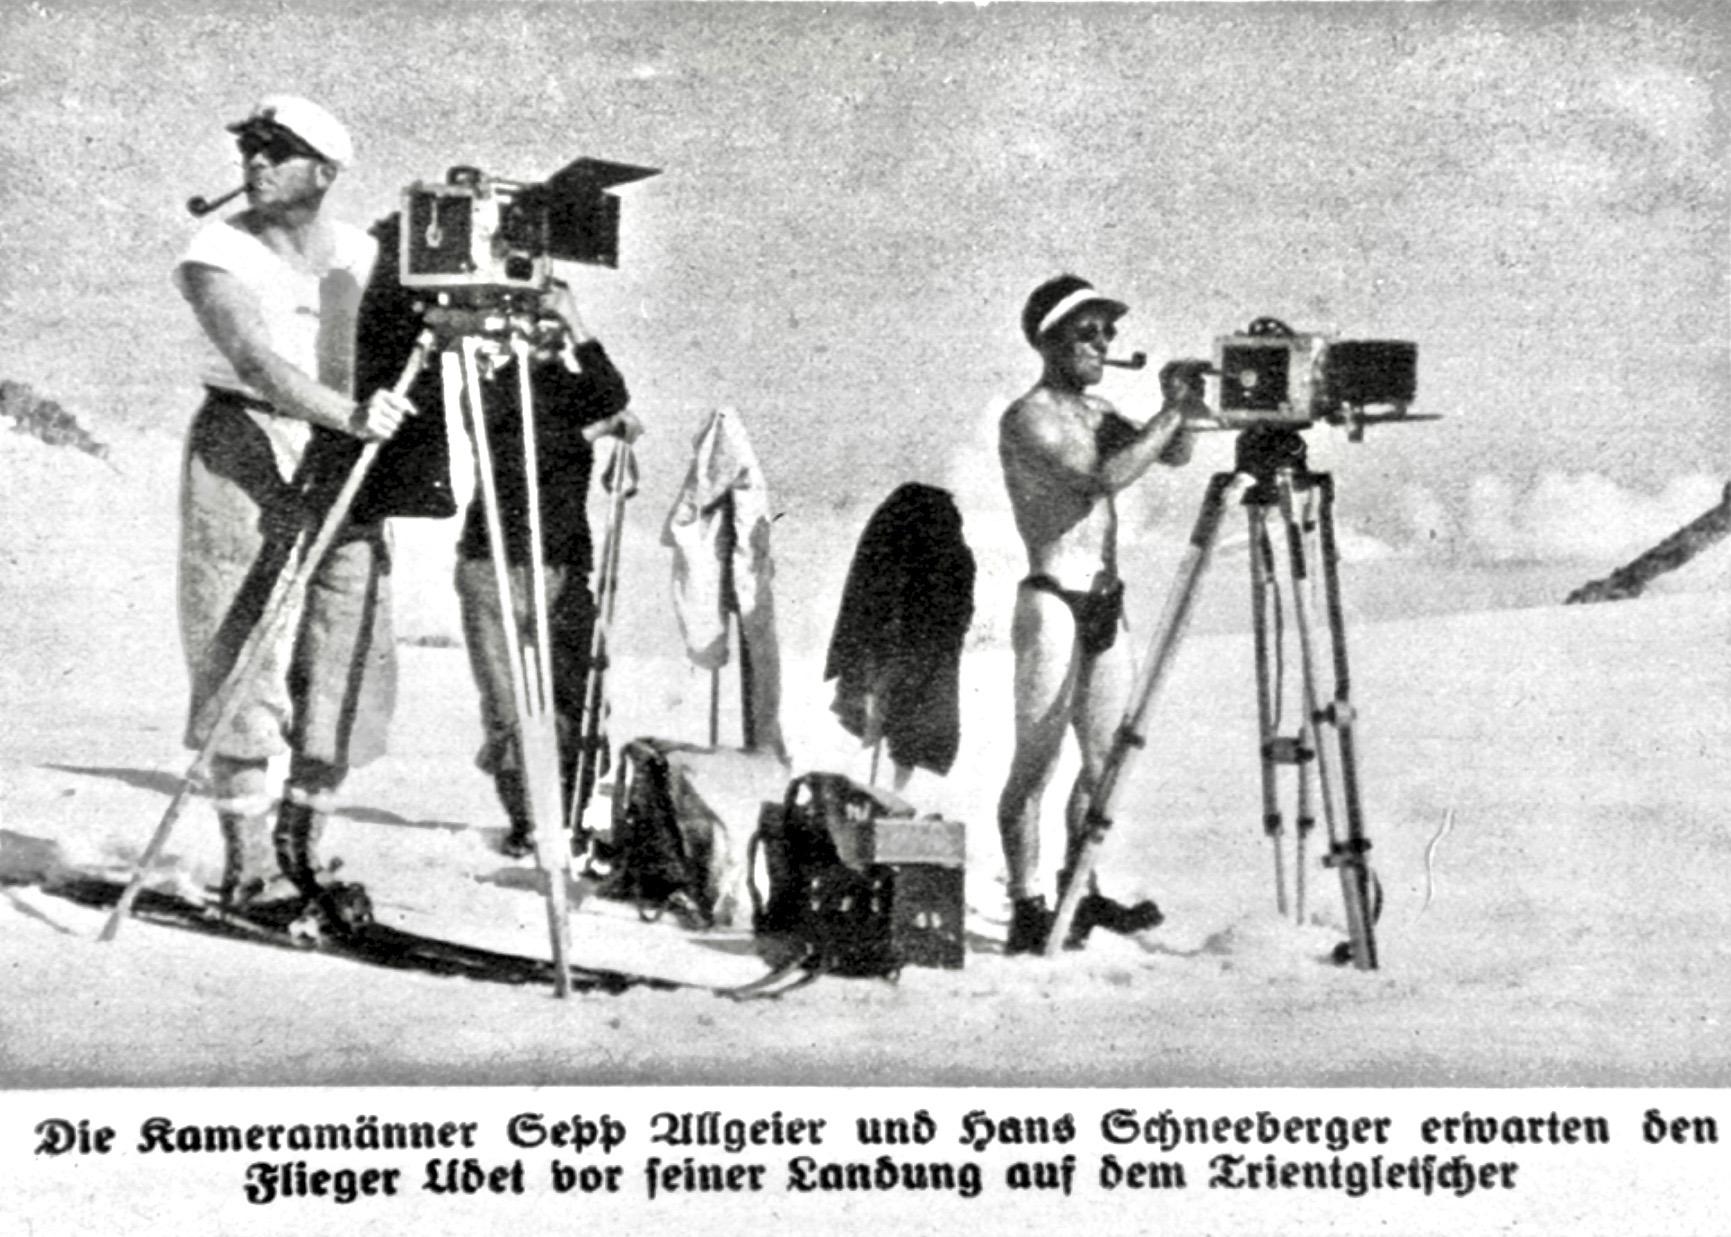 Resultado de imagen para Sepp Allgeier